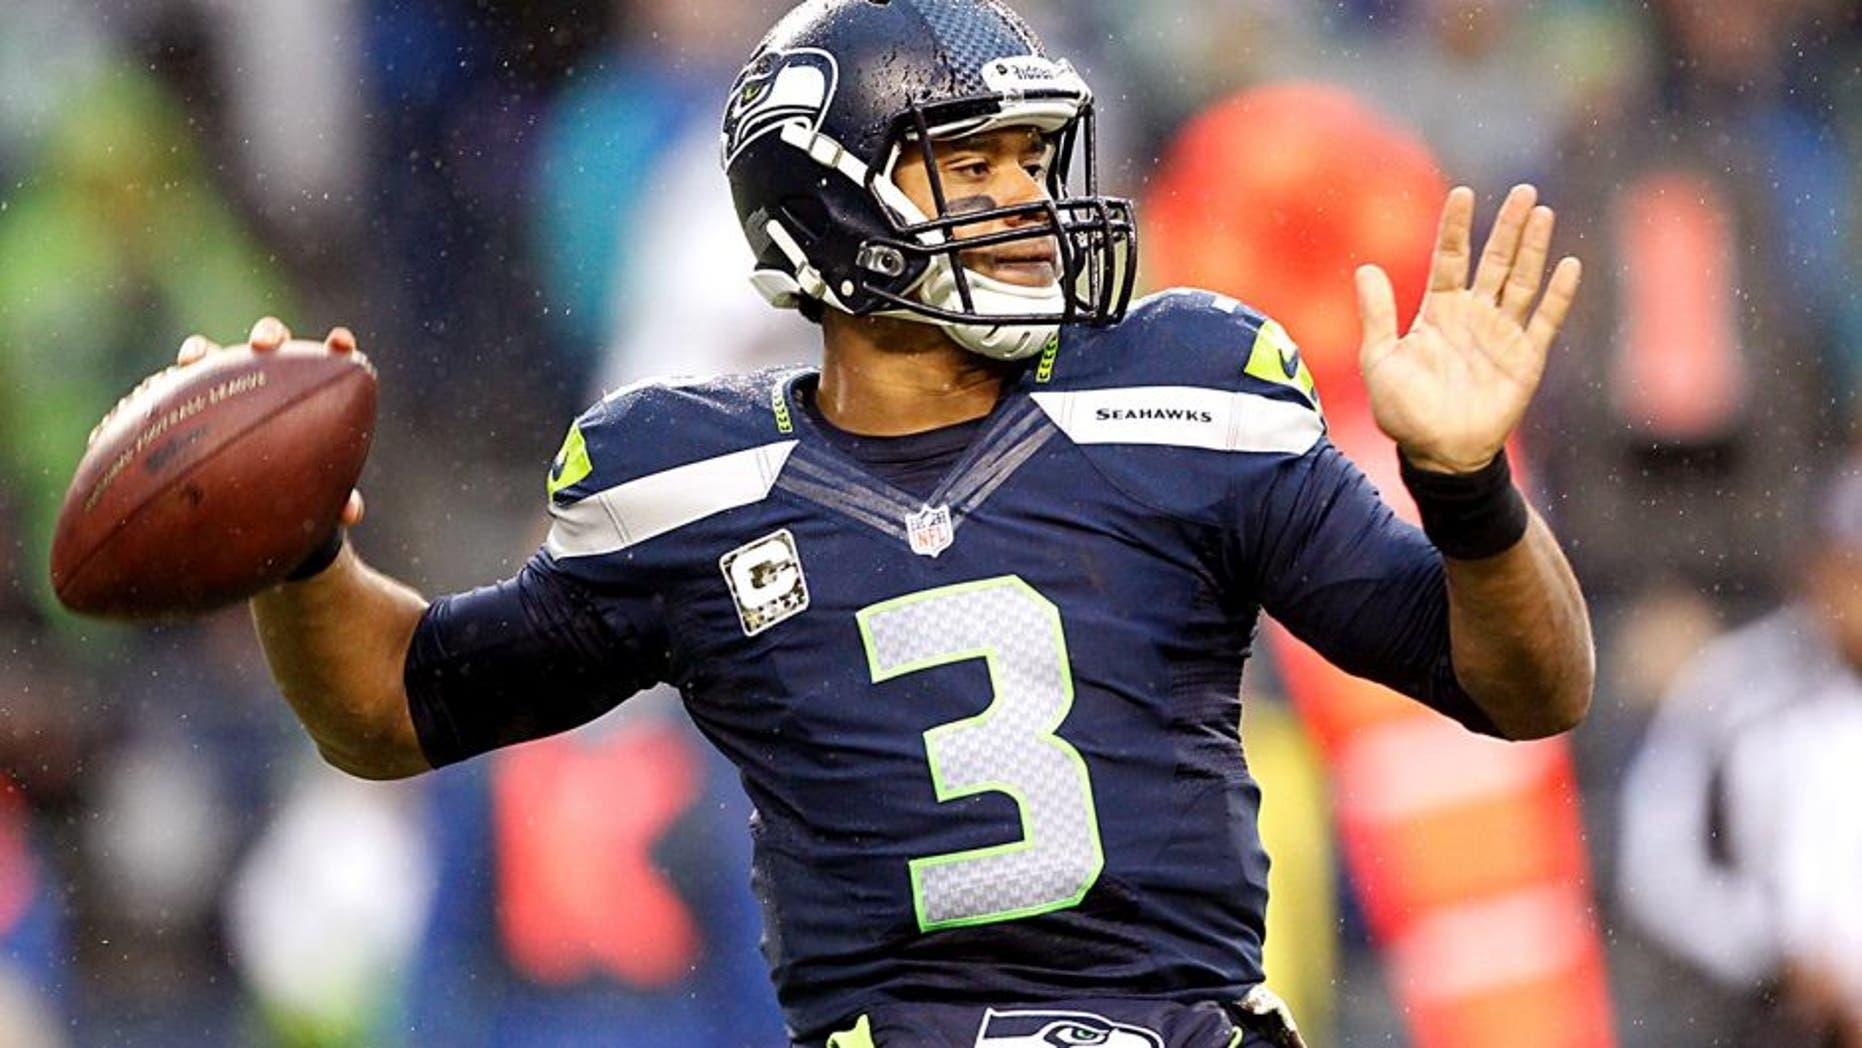 Nov 17, 2013; Seattle, WA, USA; Seattle Seahawks quarterback Russell Wilson (3) passes against the Minnesota Vikings during the second half at CenturyLink Field. Mandatory Credit: Joe Nicholson-USA TODAY Sports